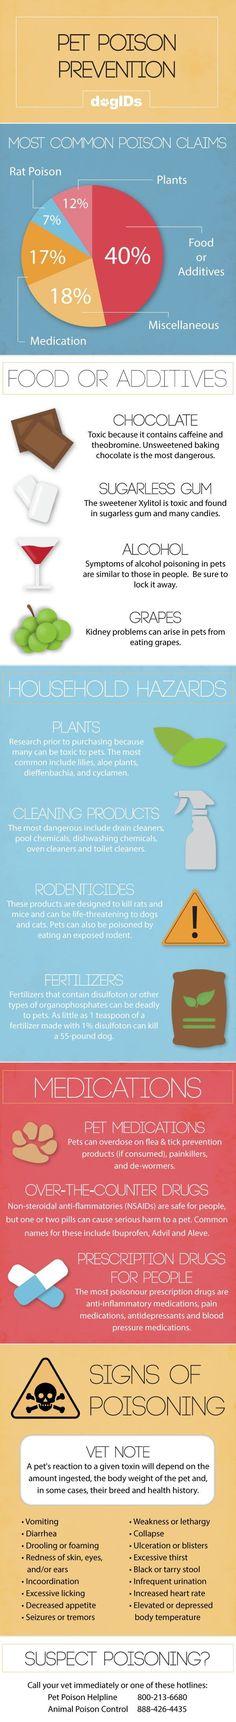 Pet Poison Prevention Infographic